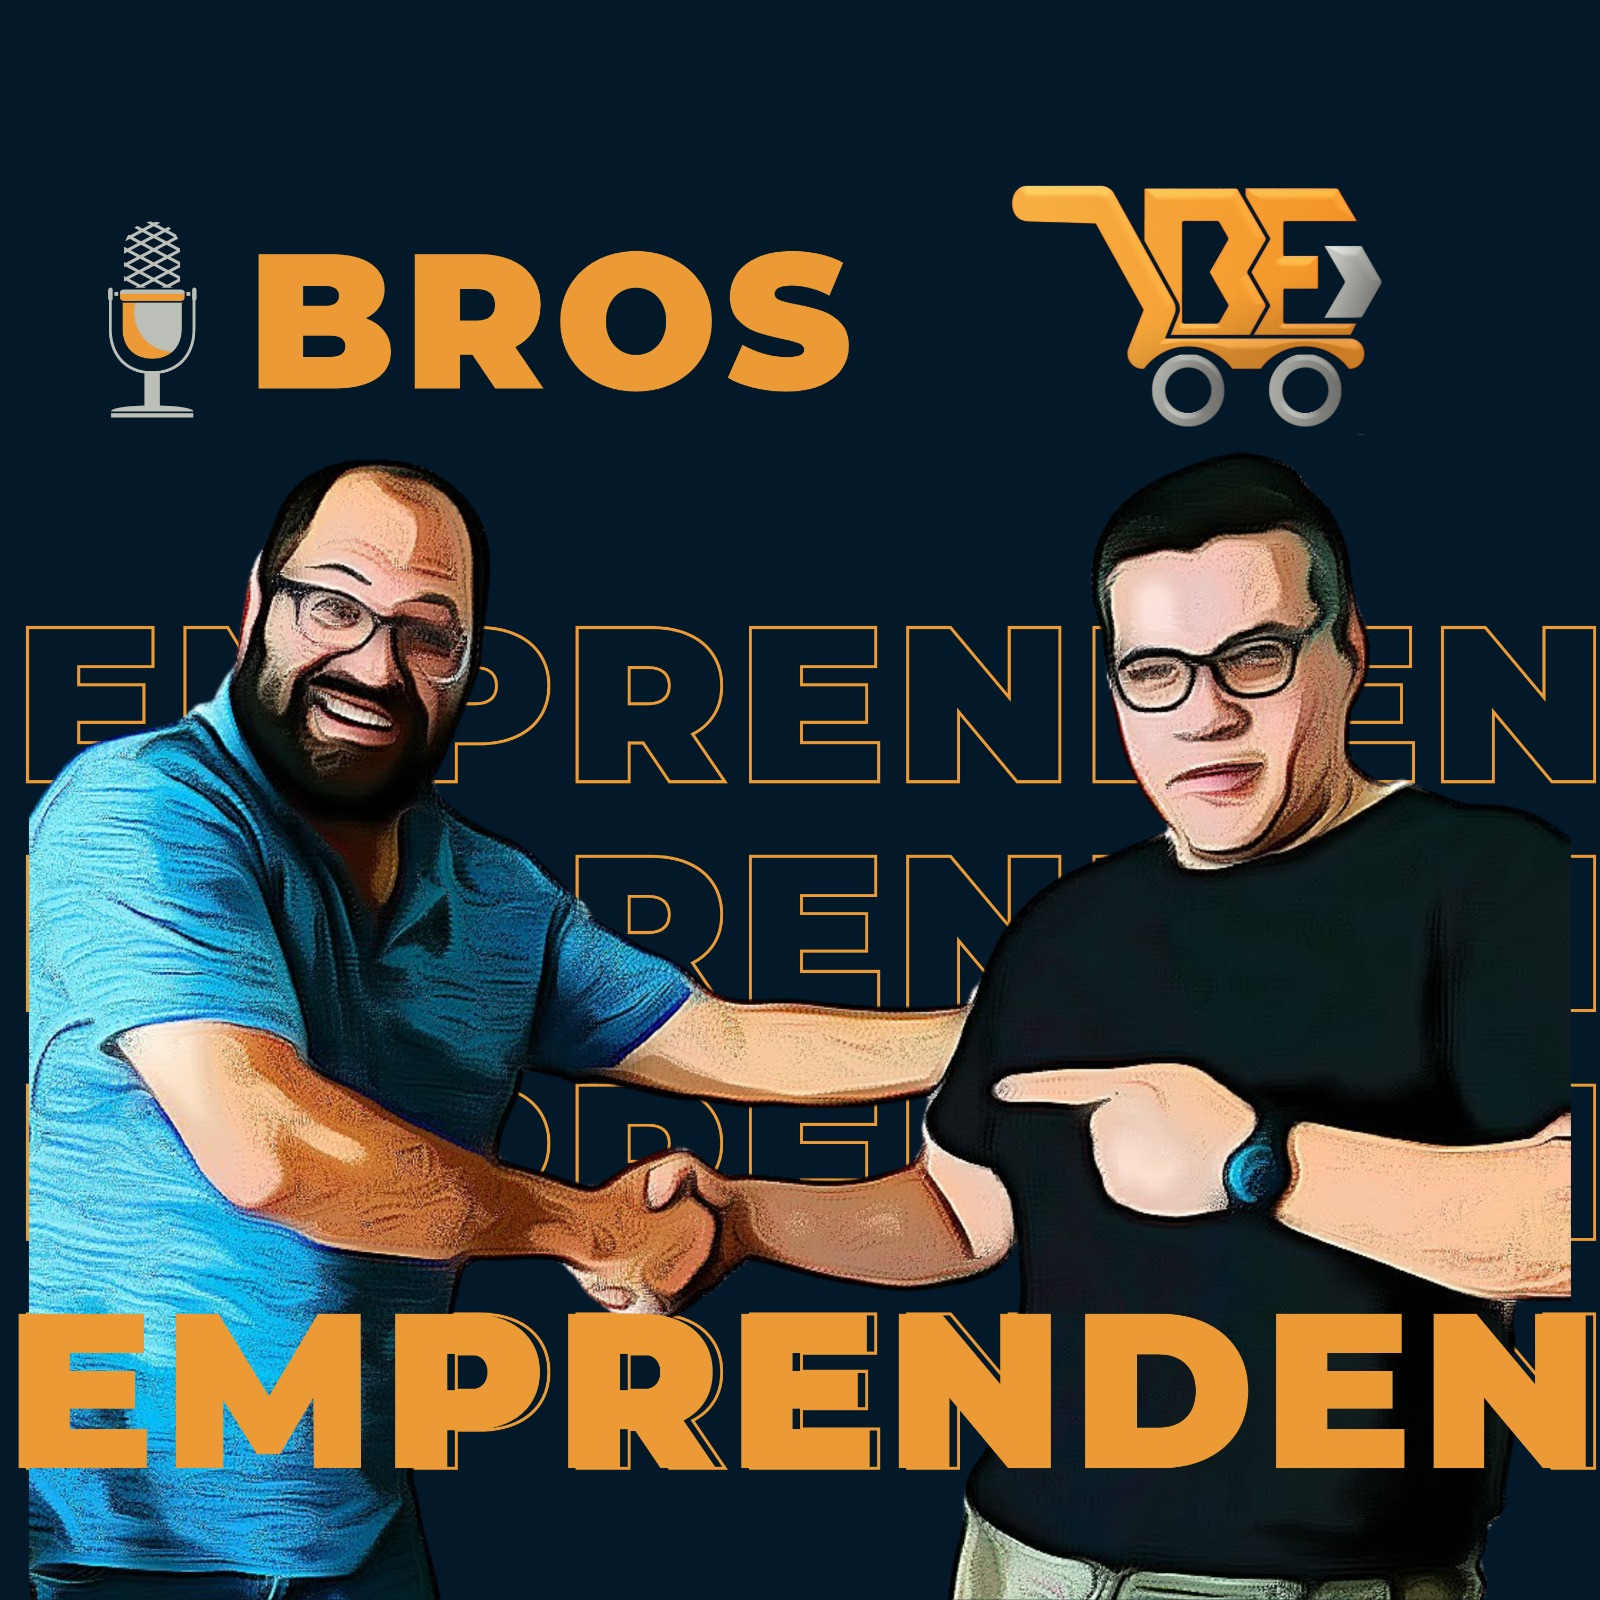 bros emprenden podcast